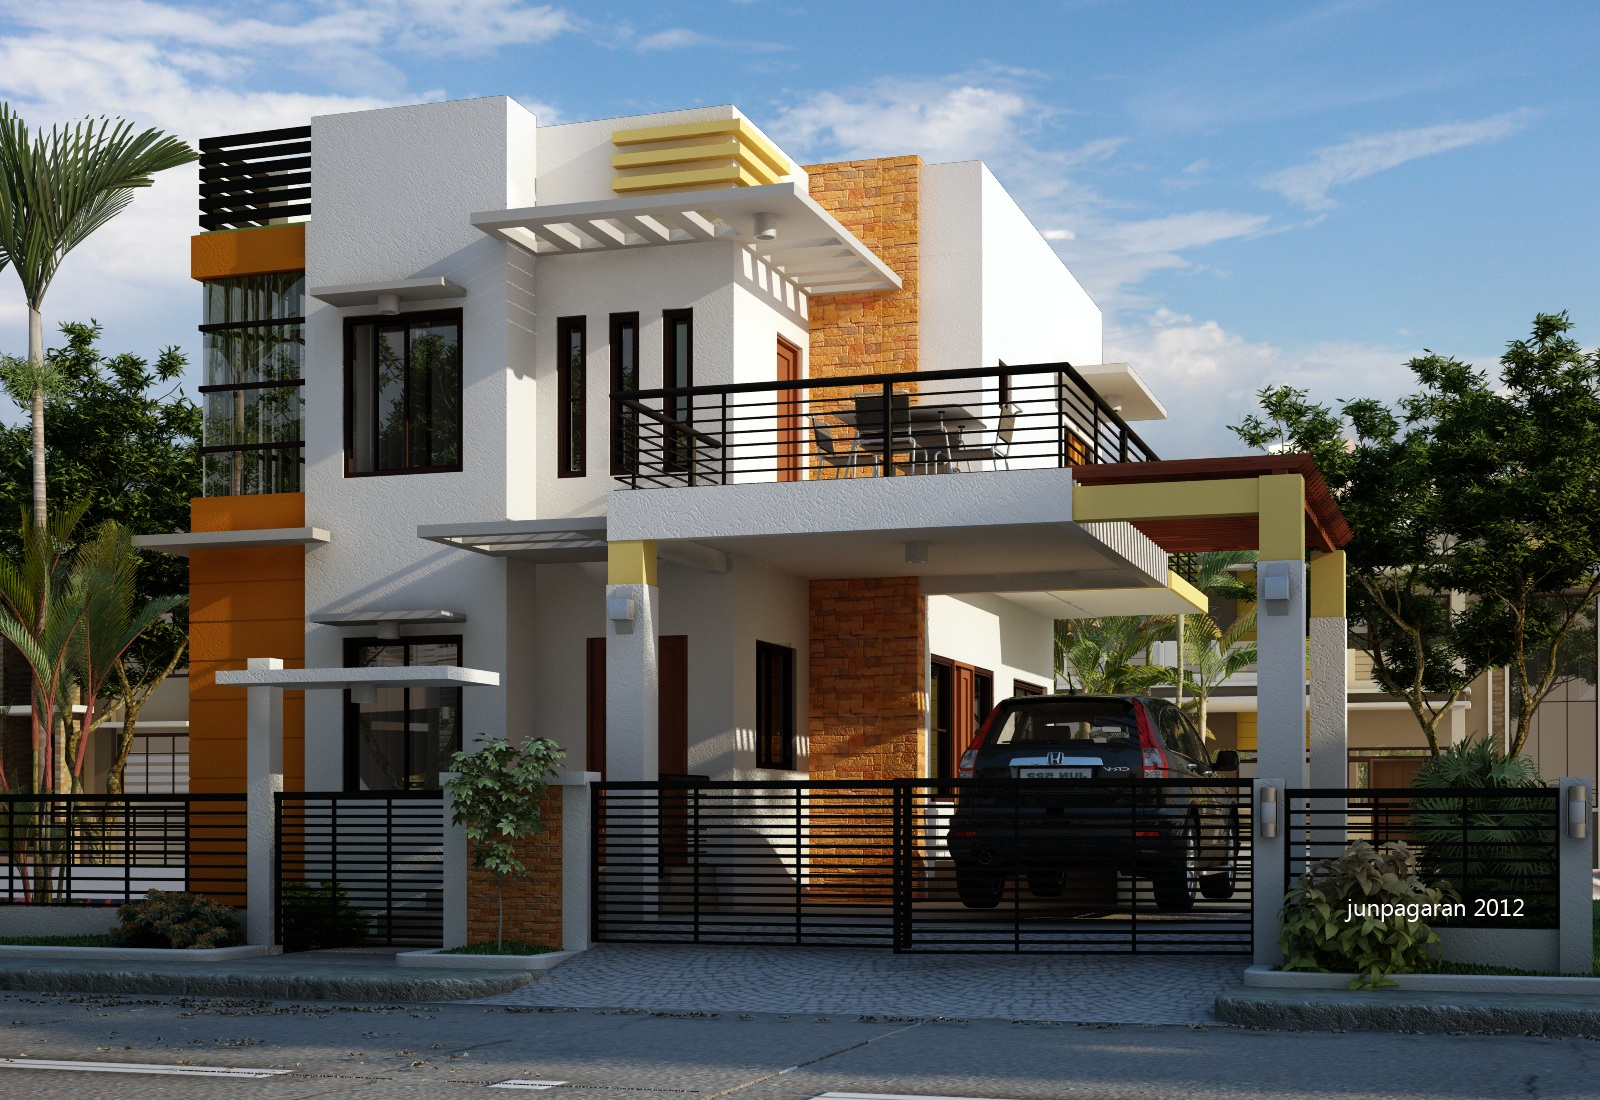 Rumah Minimalis Modern 2 Lantai Di Lahan Sempit 2017 Cafe Elwazeen